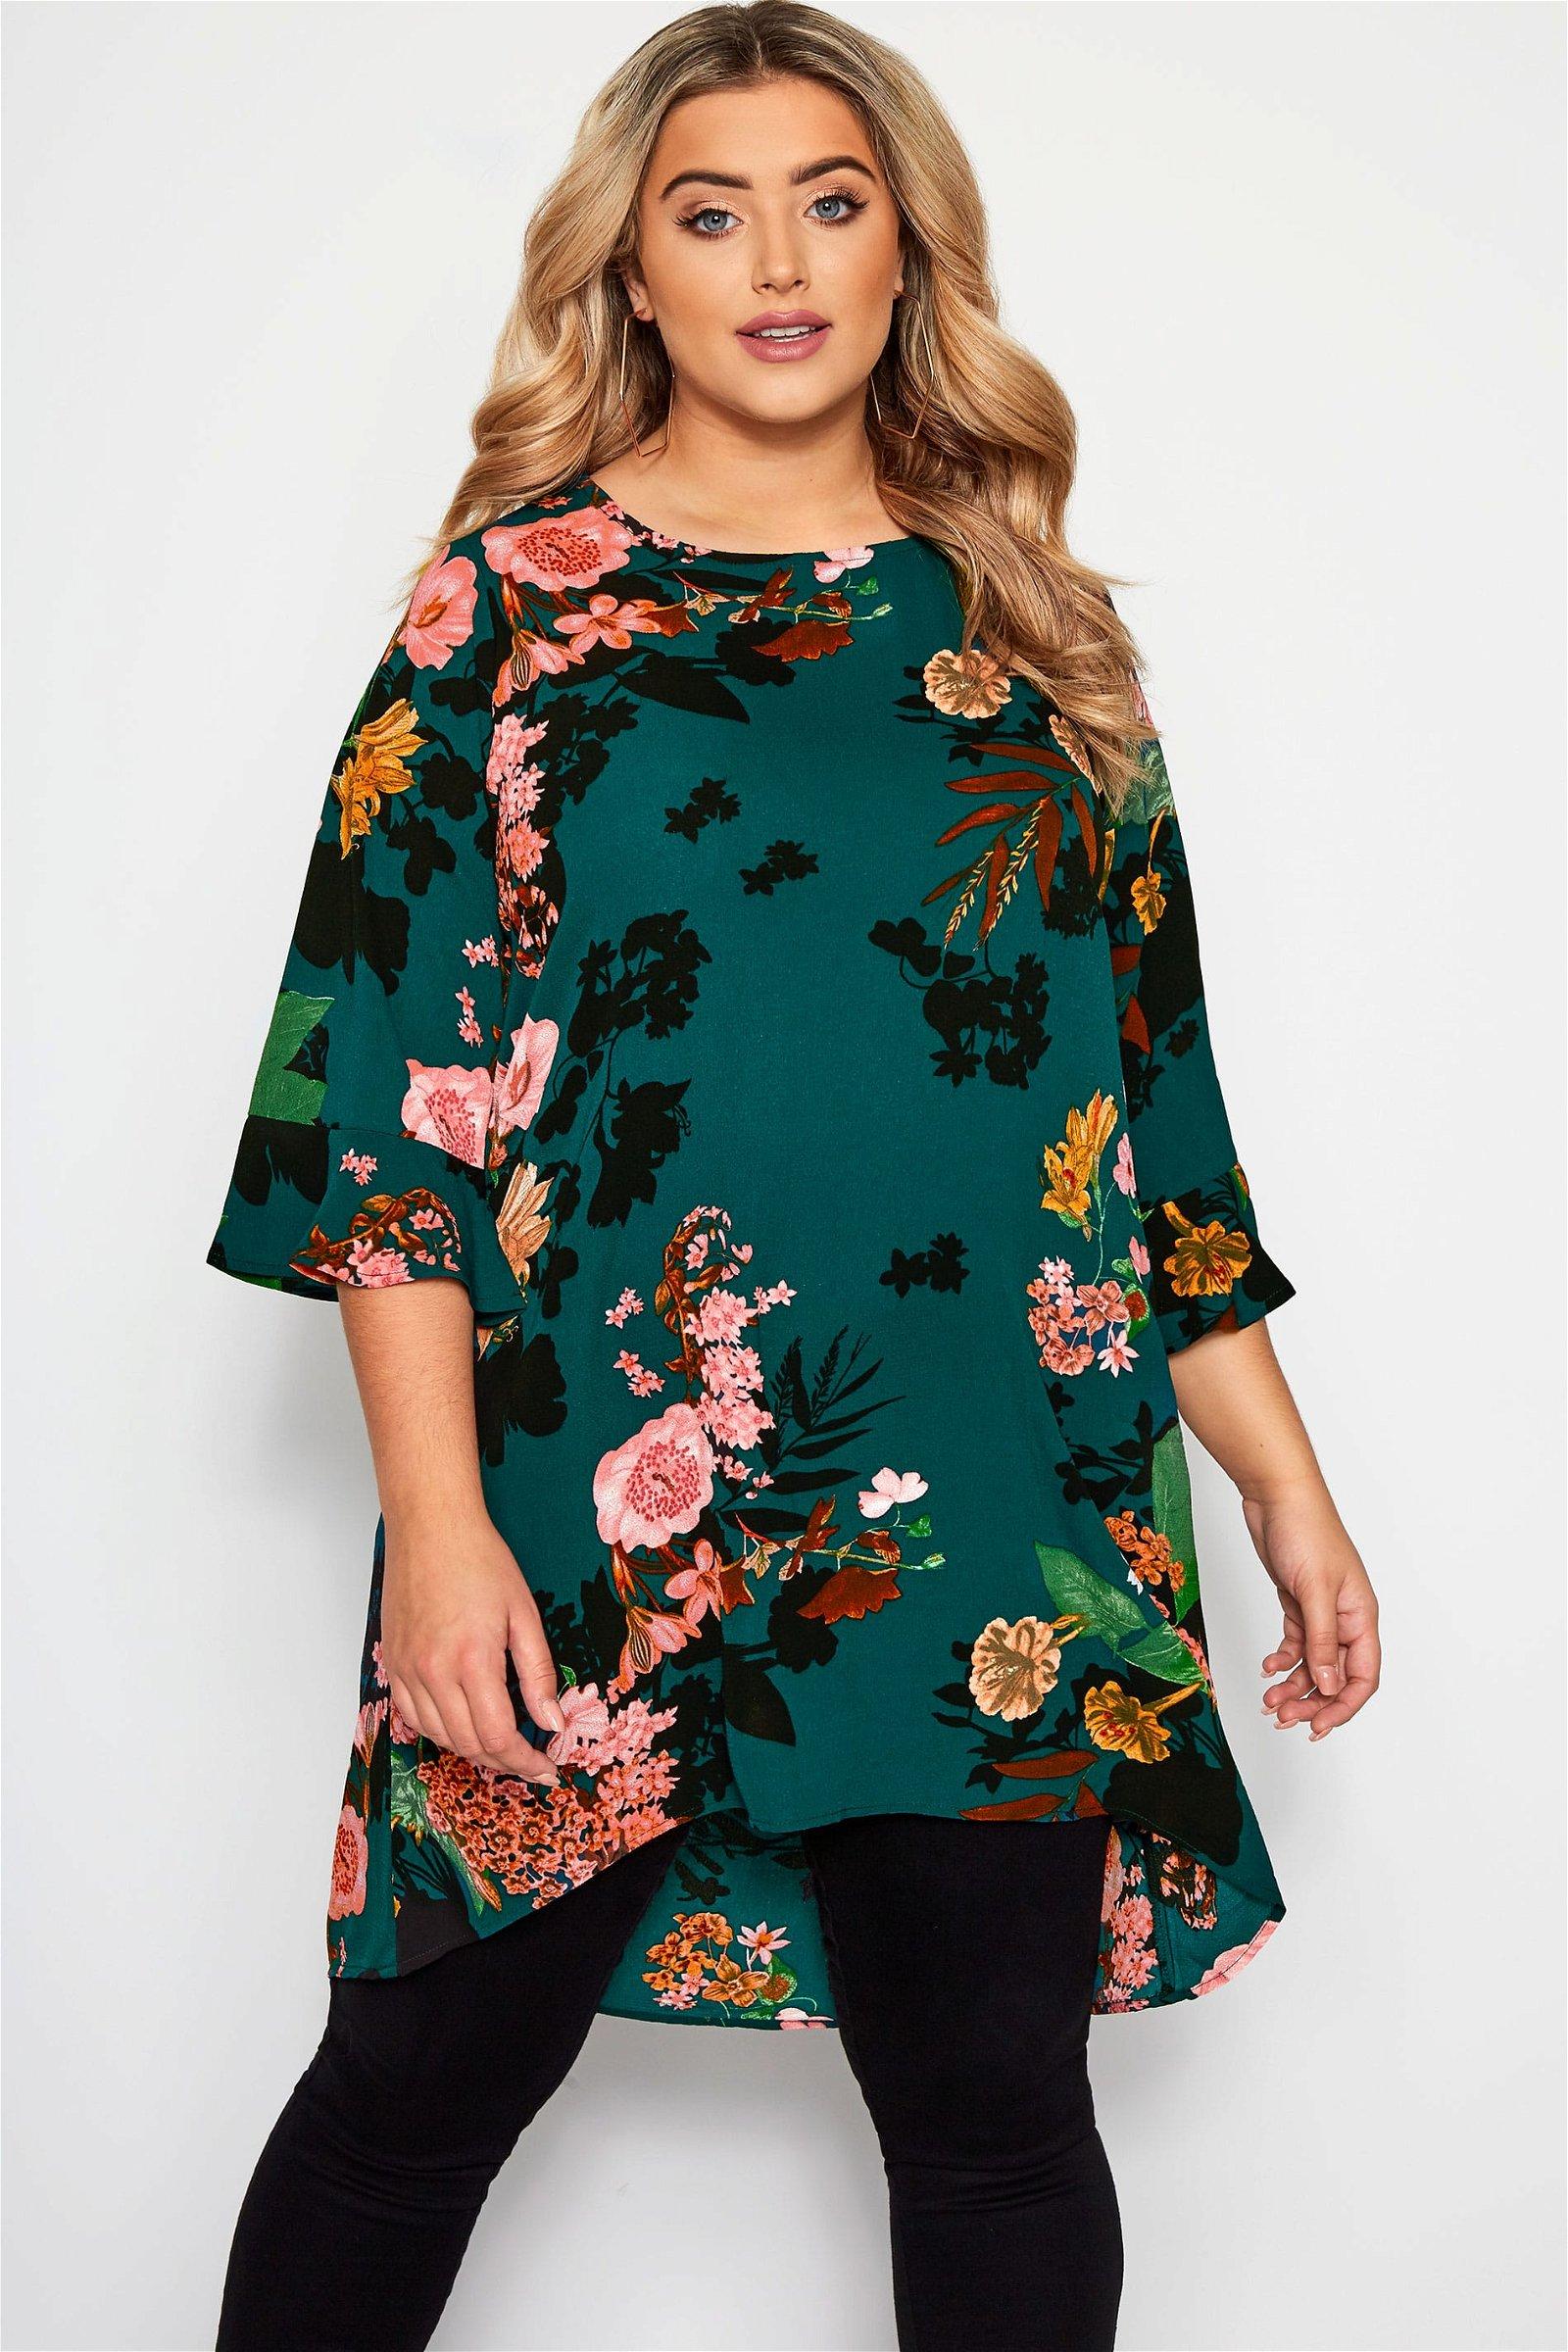 YOURS LONDON Bottle Green Floral Print Longline Blouse